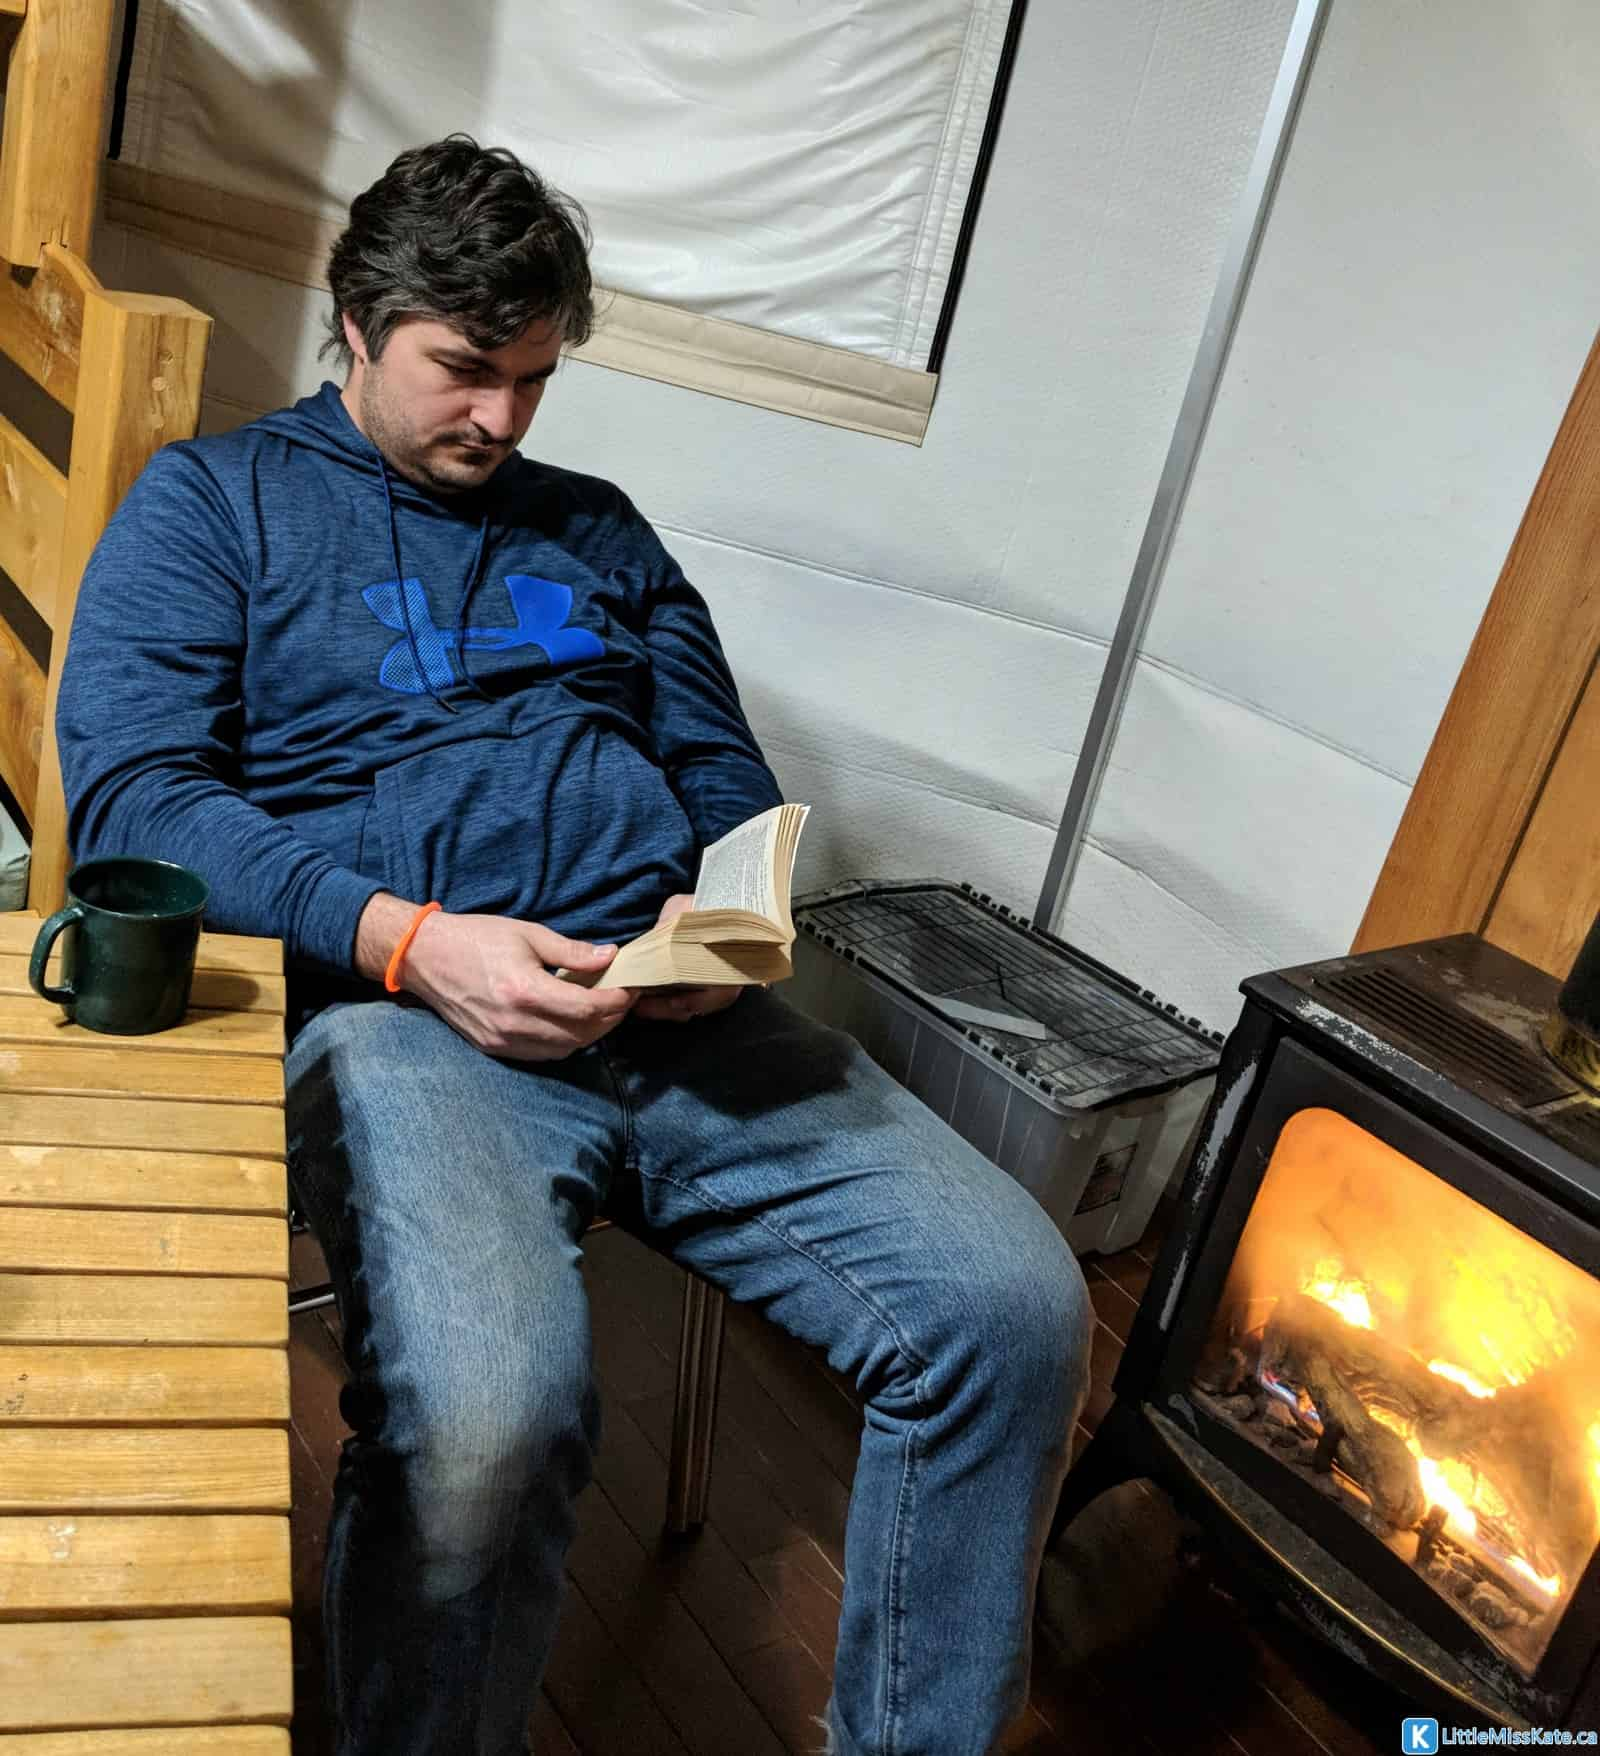 glamping ontario winter camping yurts MacGregor Point